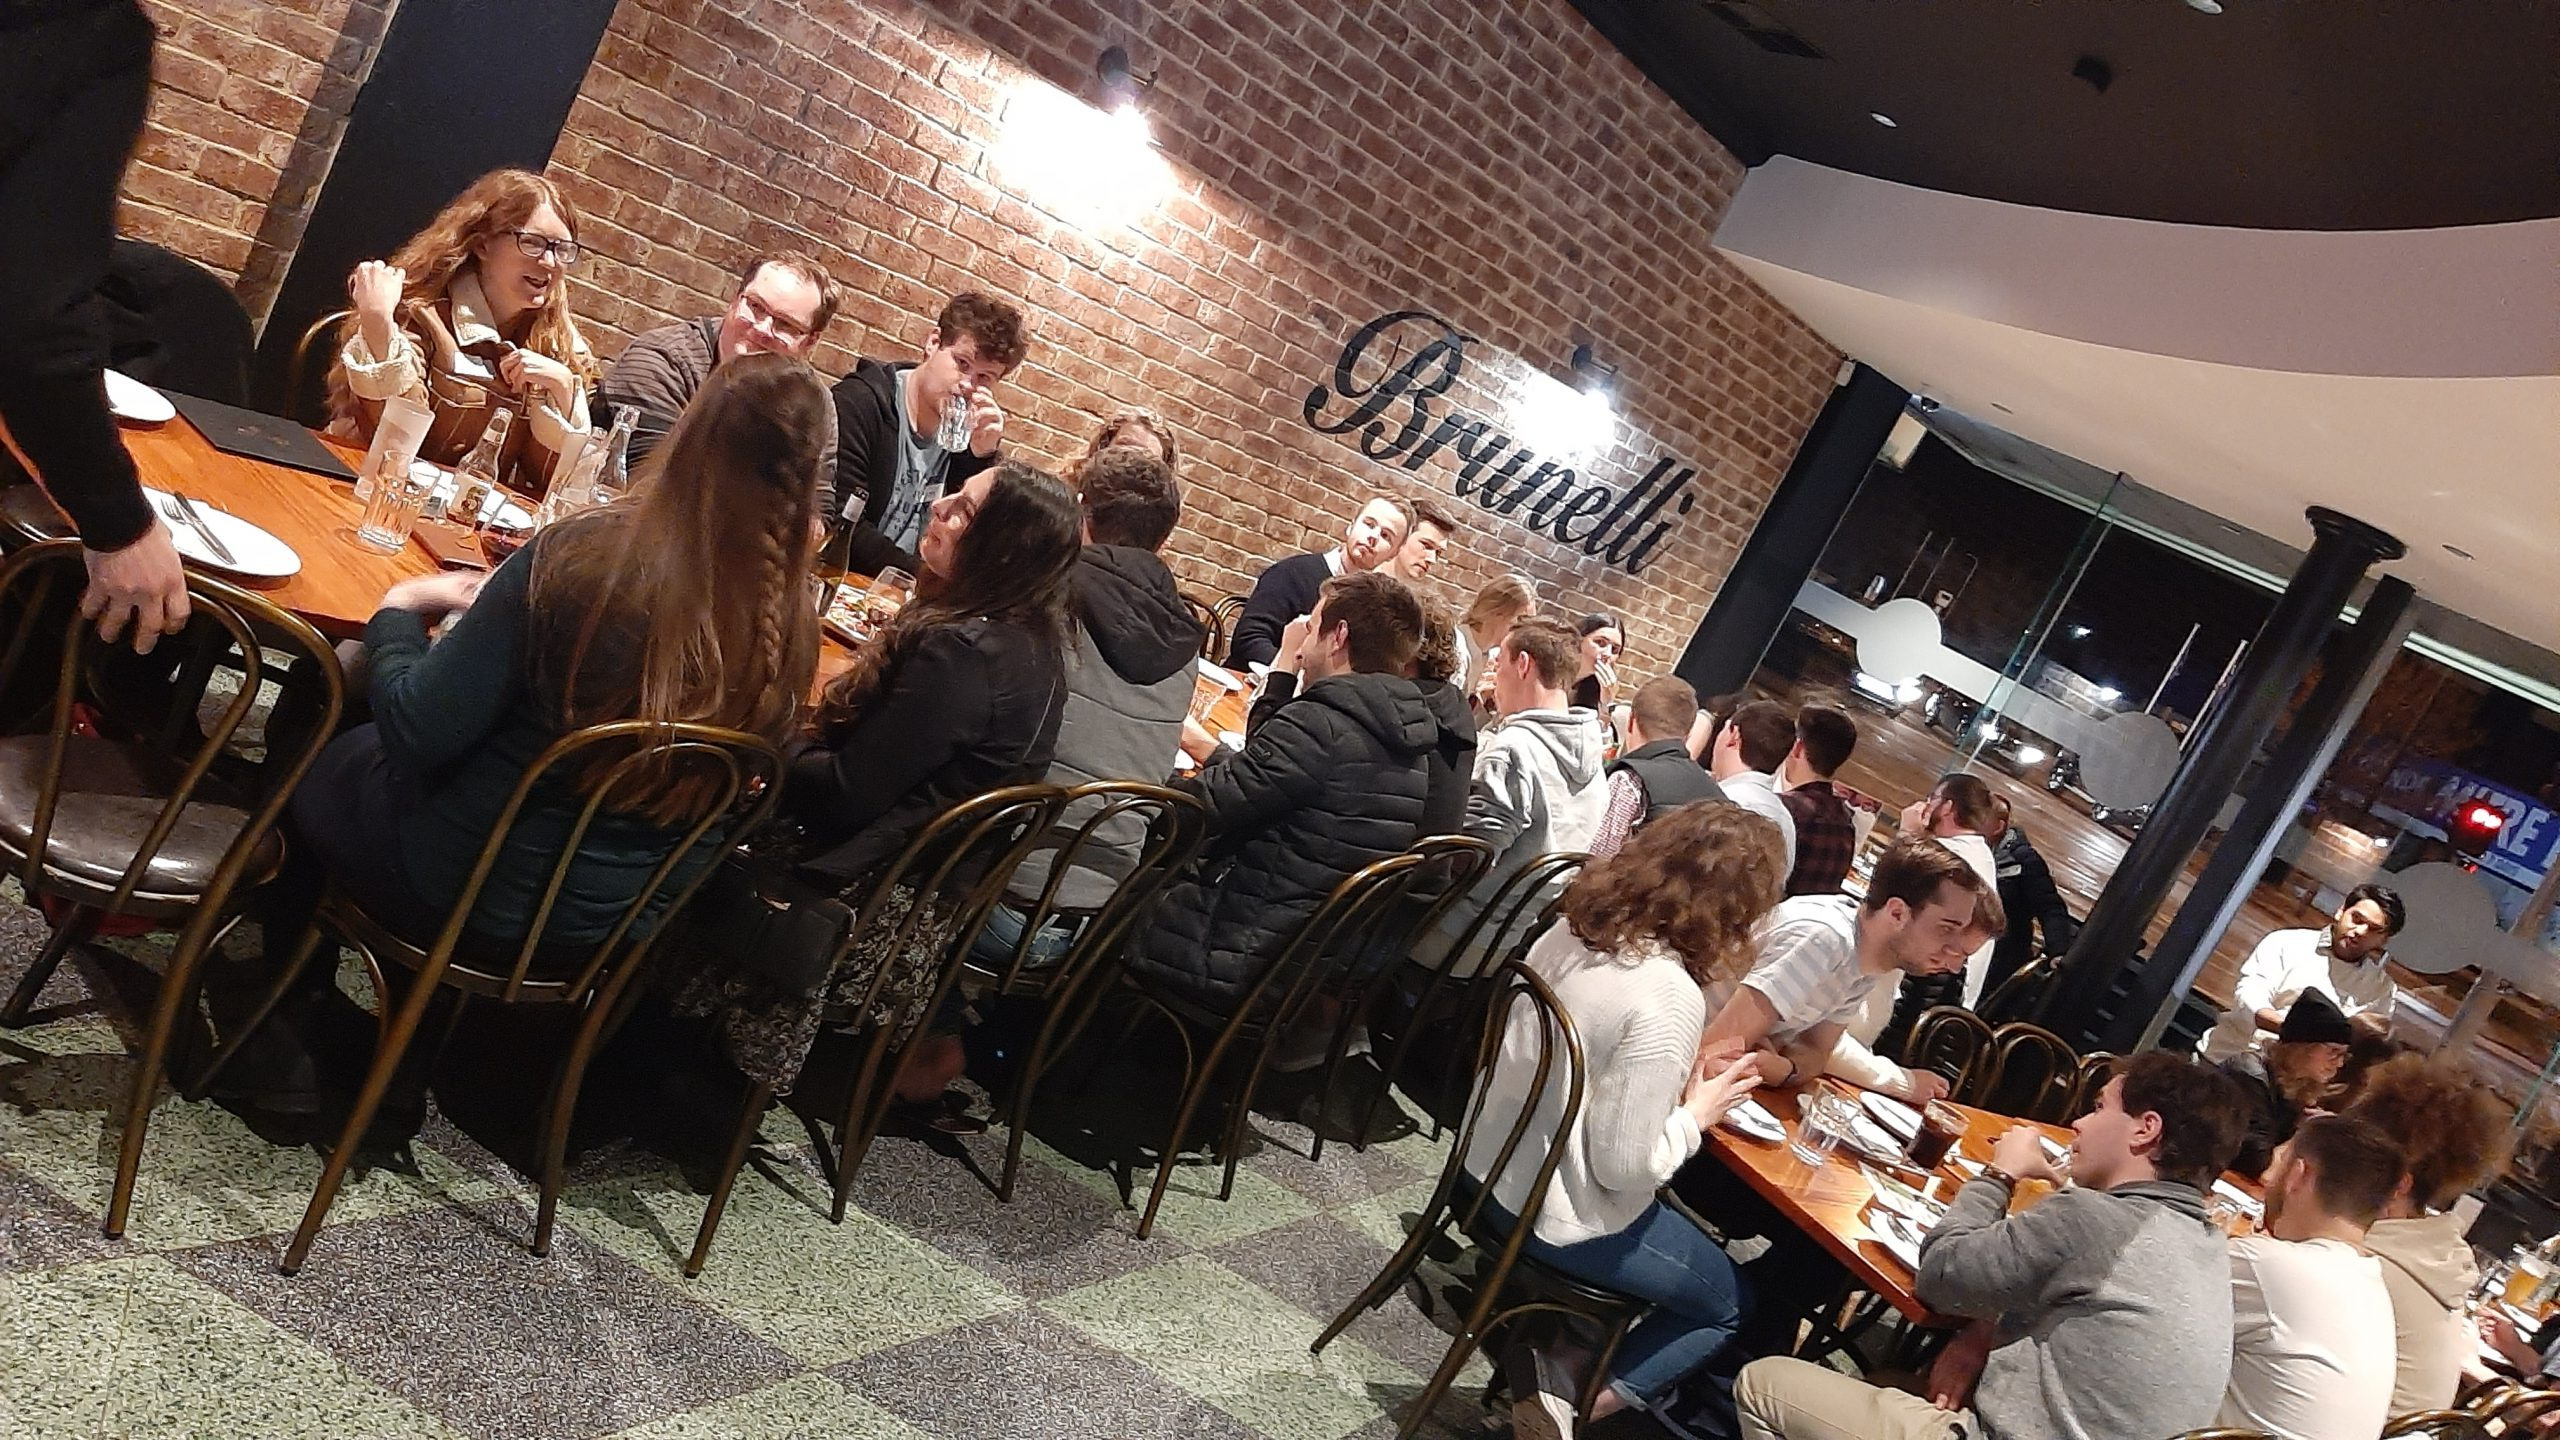 Cafe Brunelli 5-6-2021 10